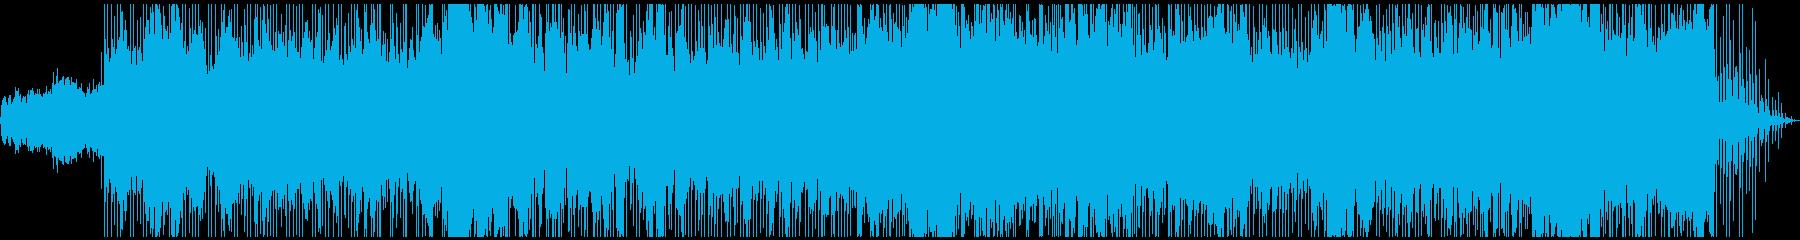 Rainbowの再生済みの波形